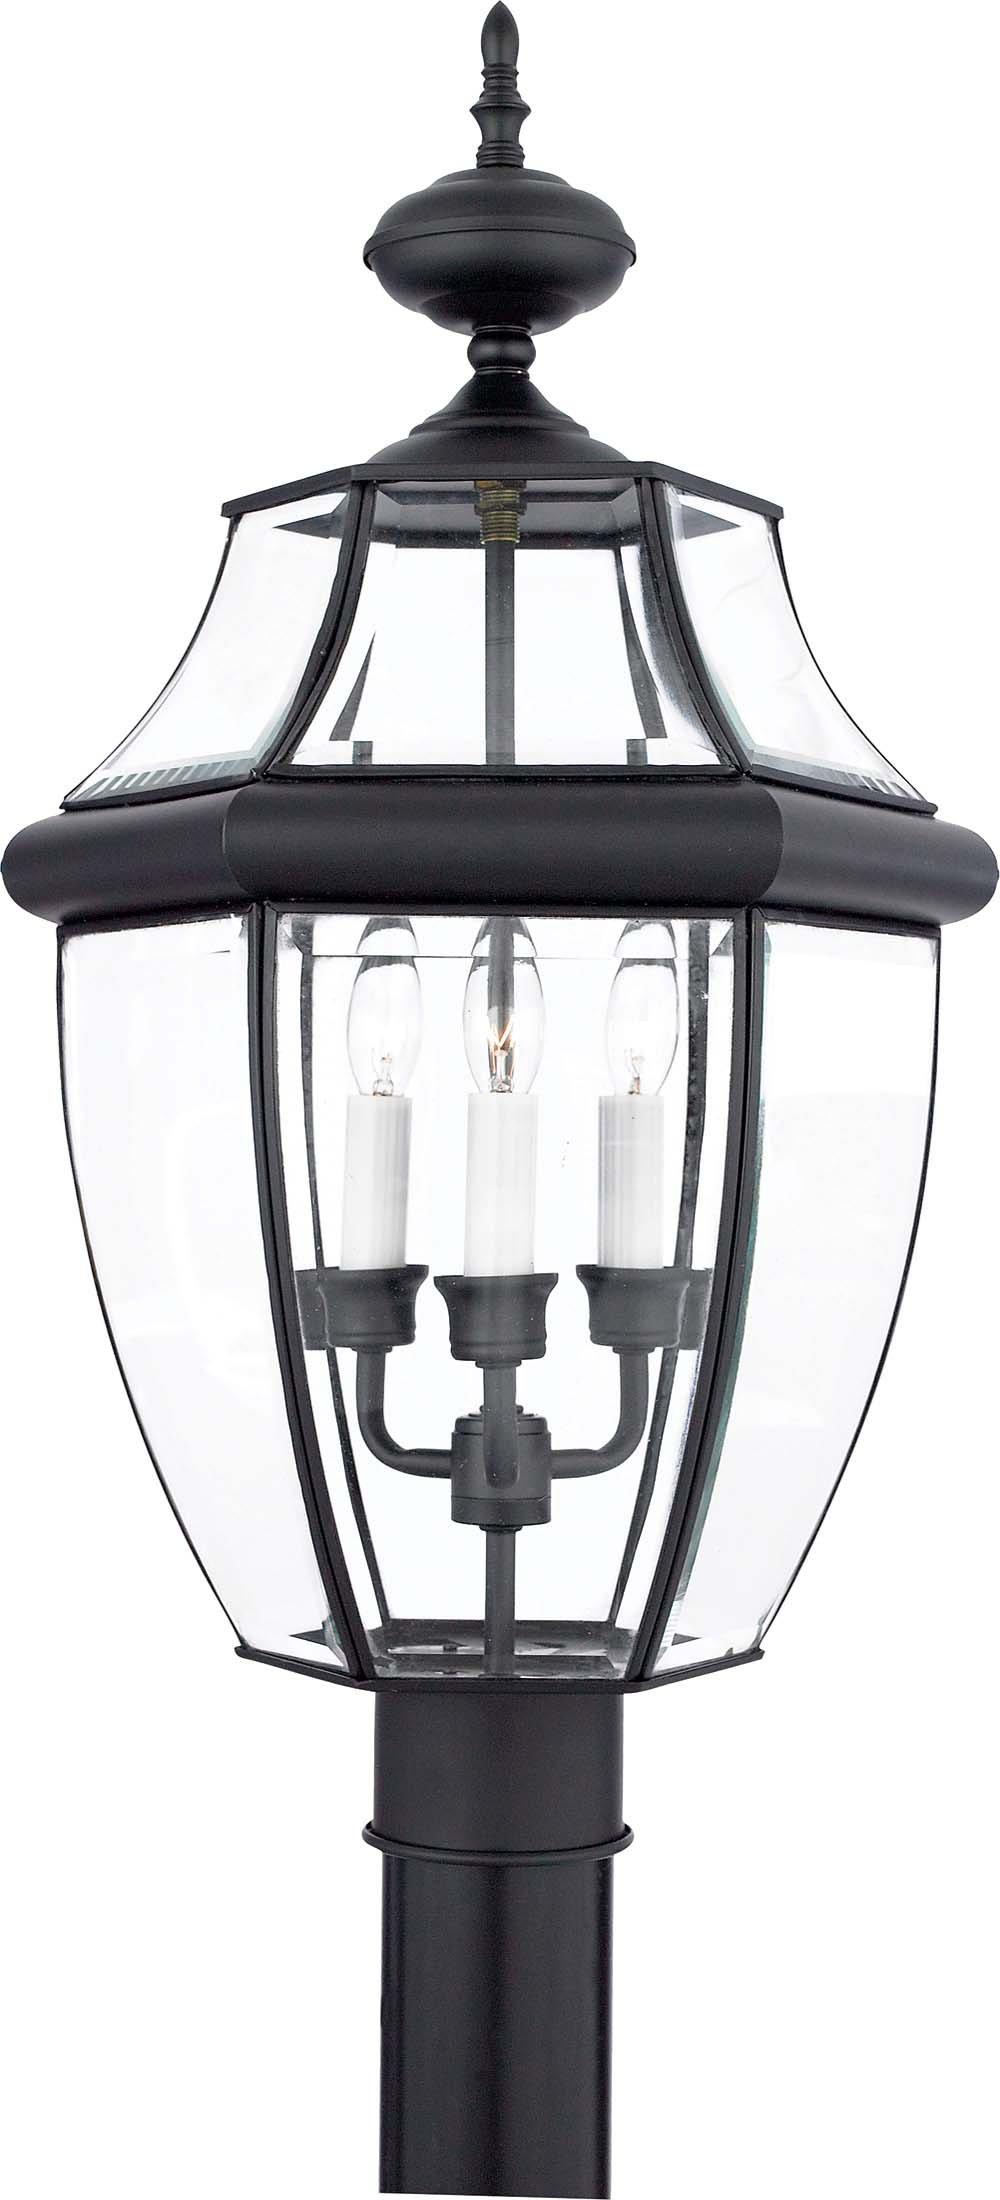 Quoizel NY9043K 3-Light Newbury Outdoor Lantern in Mystic Black